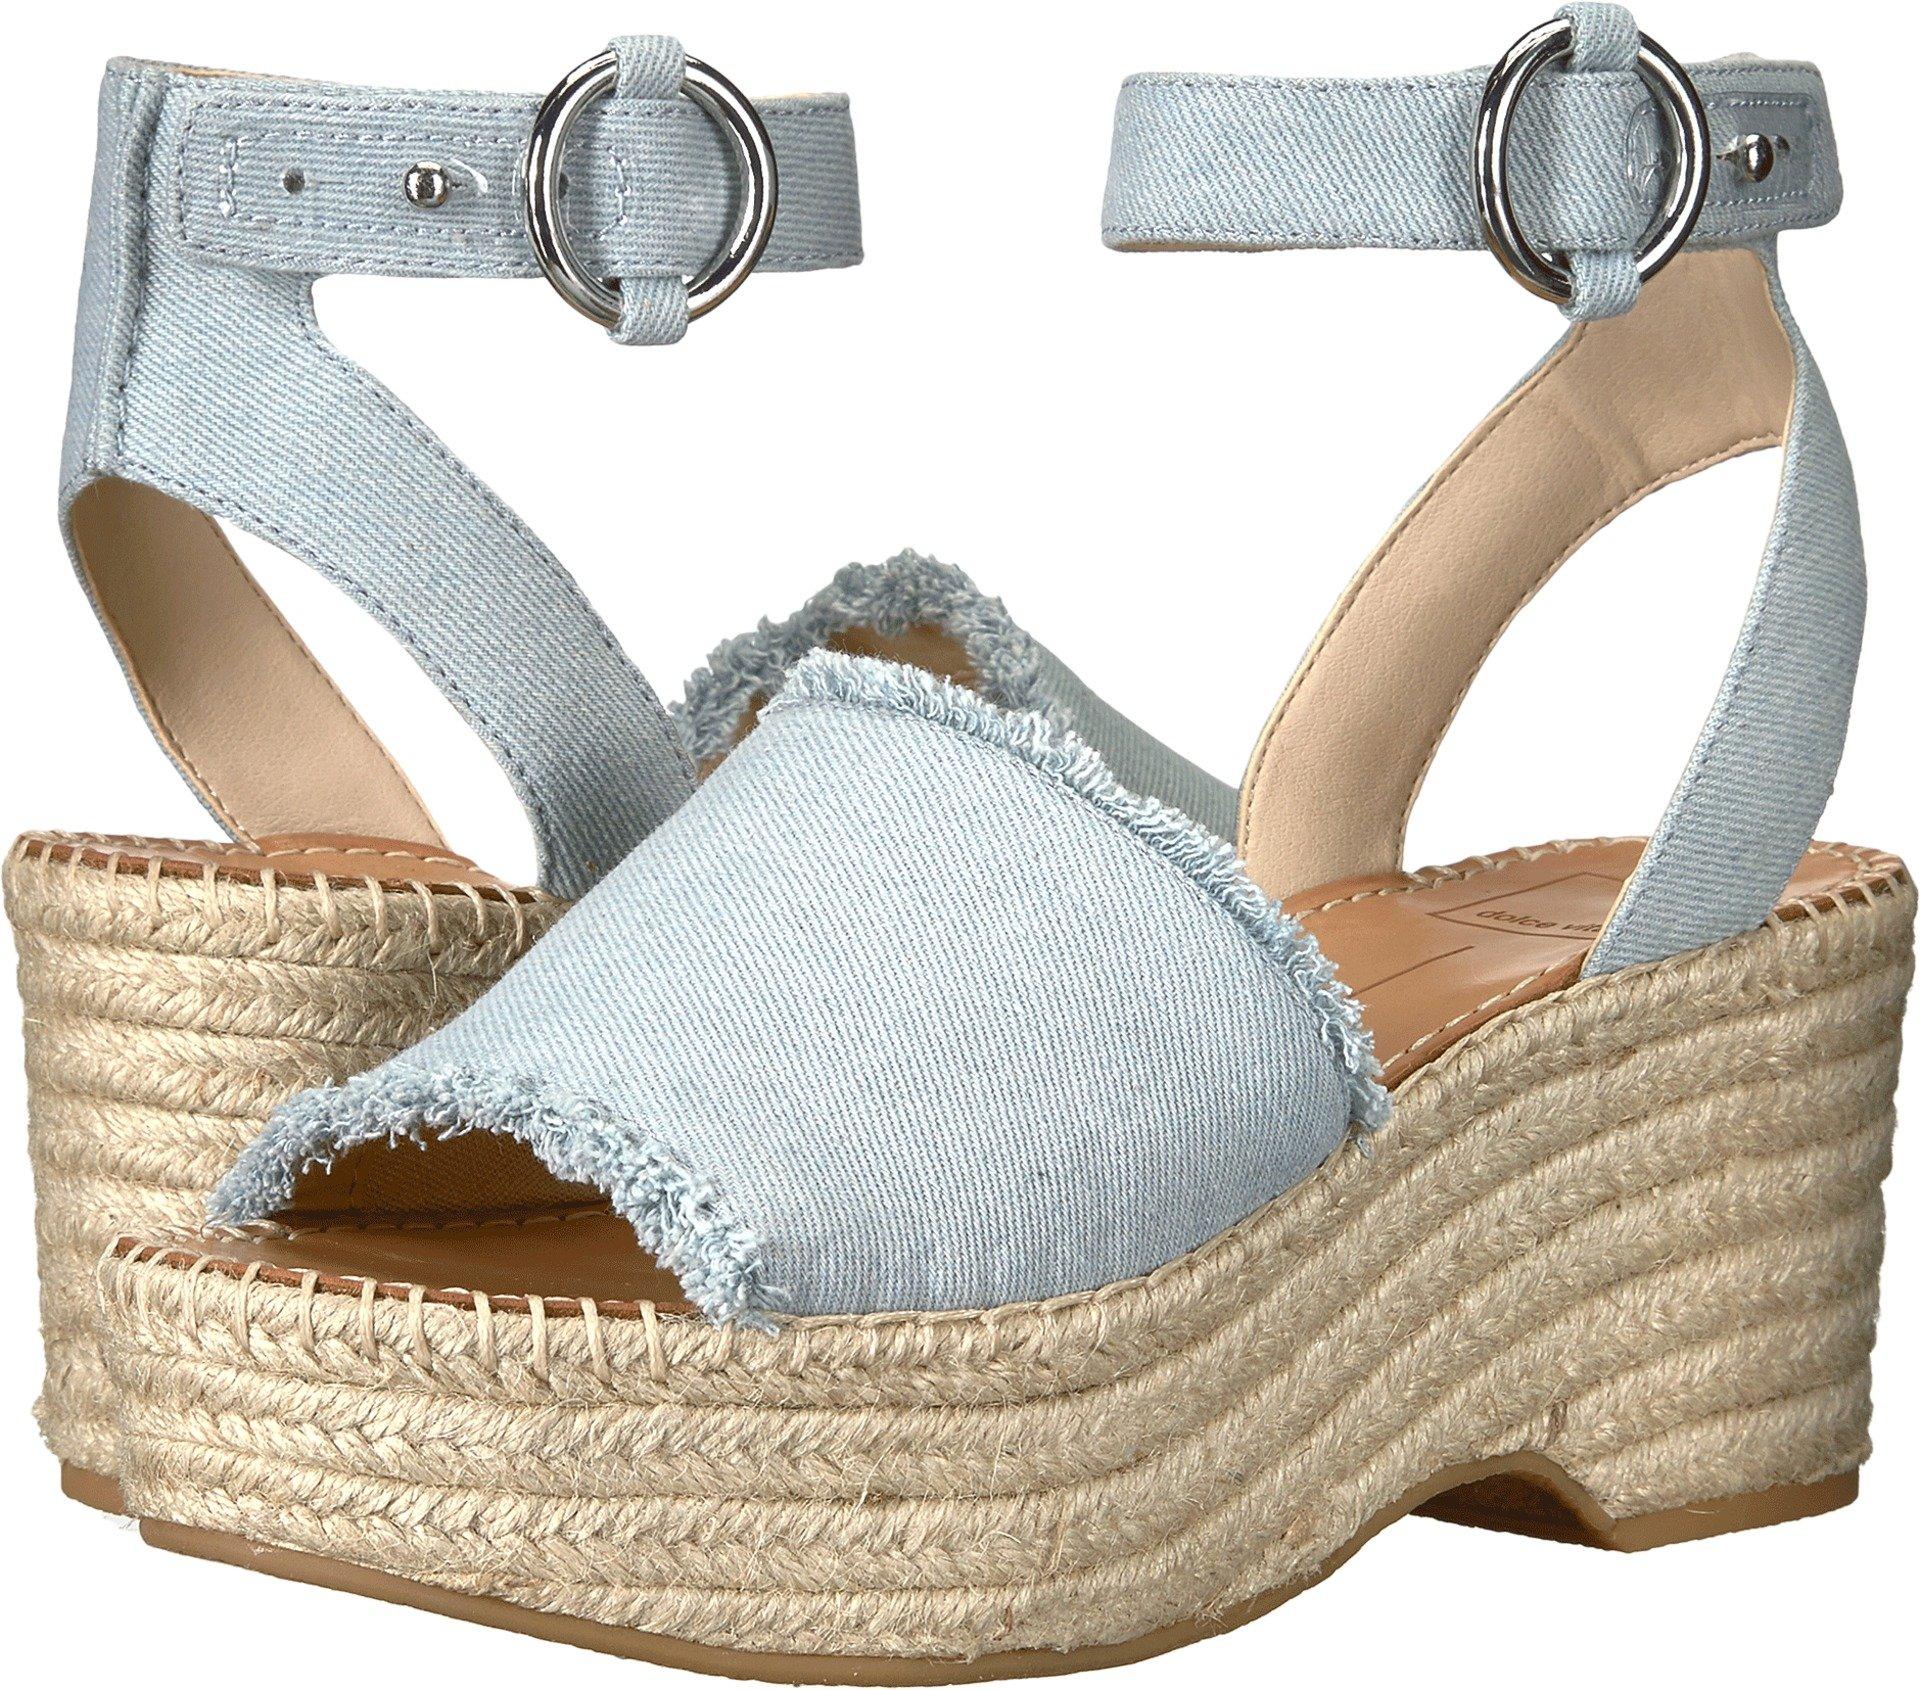 Dolce Vita Women's Lesly Espadrille Wedge Sandal, Light Blue Denim, 7.5 M US